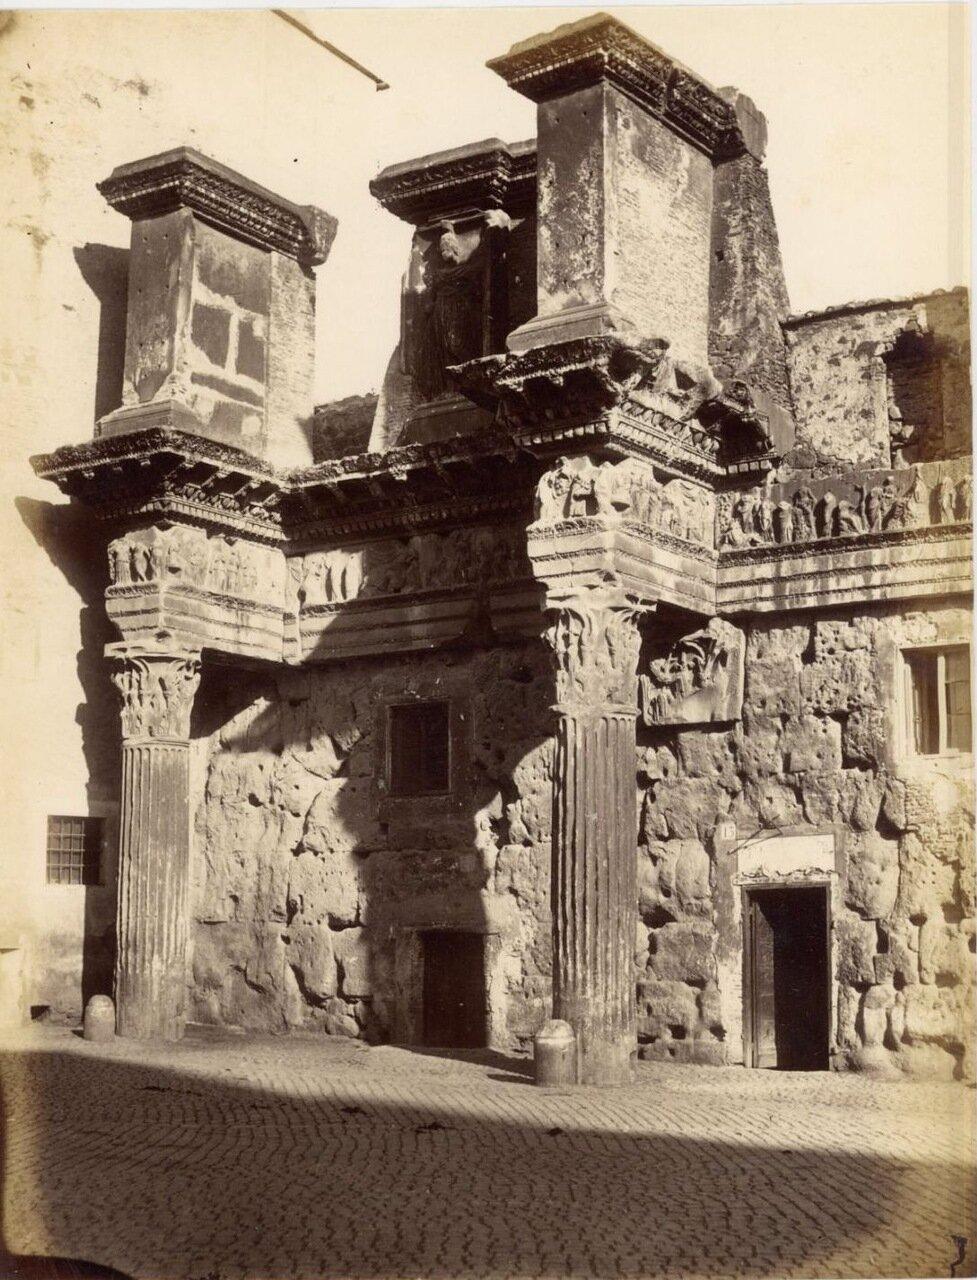 Форум Нервы. Колоннада. 1870